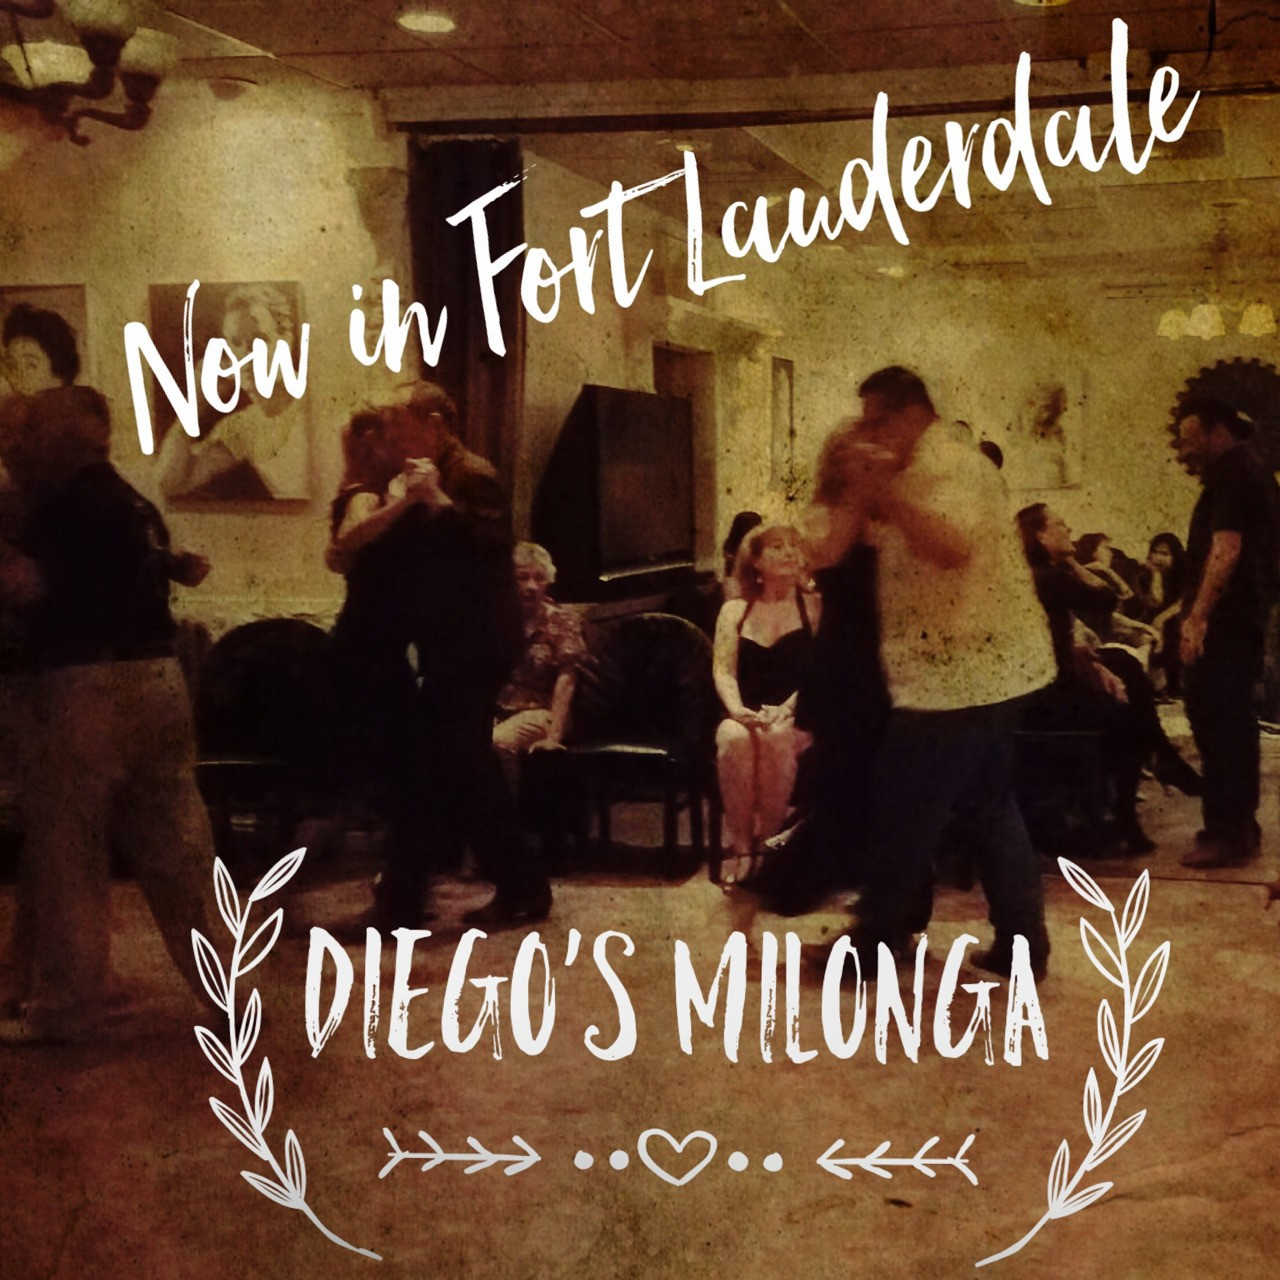 Learn Tango in Fort Lauderdale! www.diegosantanatango.com